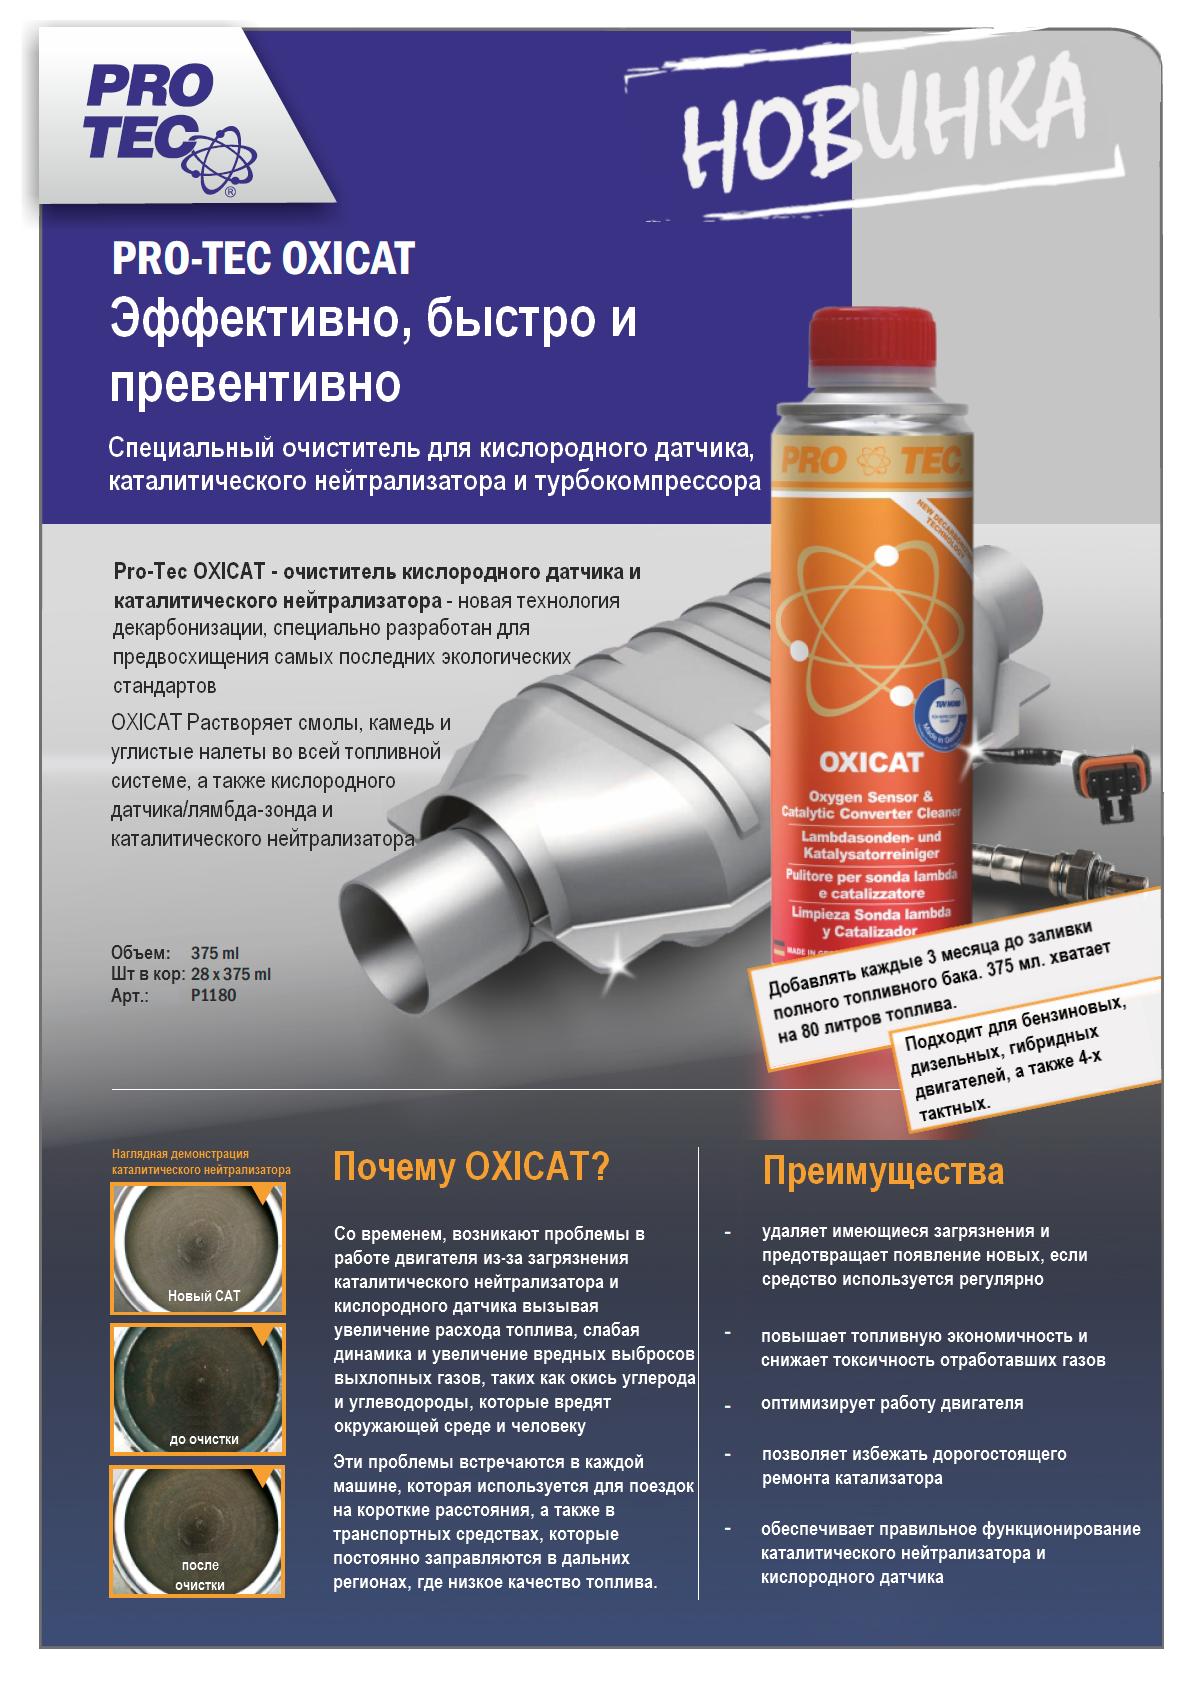 OXICAT – Oxygen Sensor & Catalytic